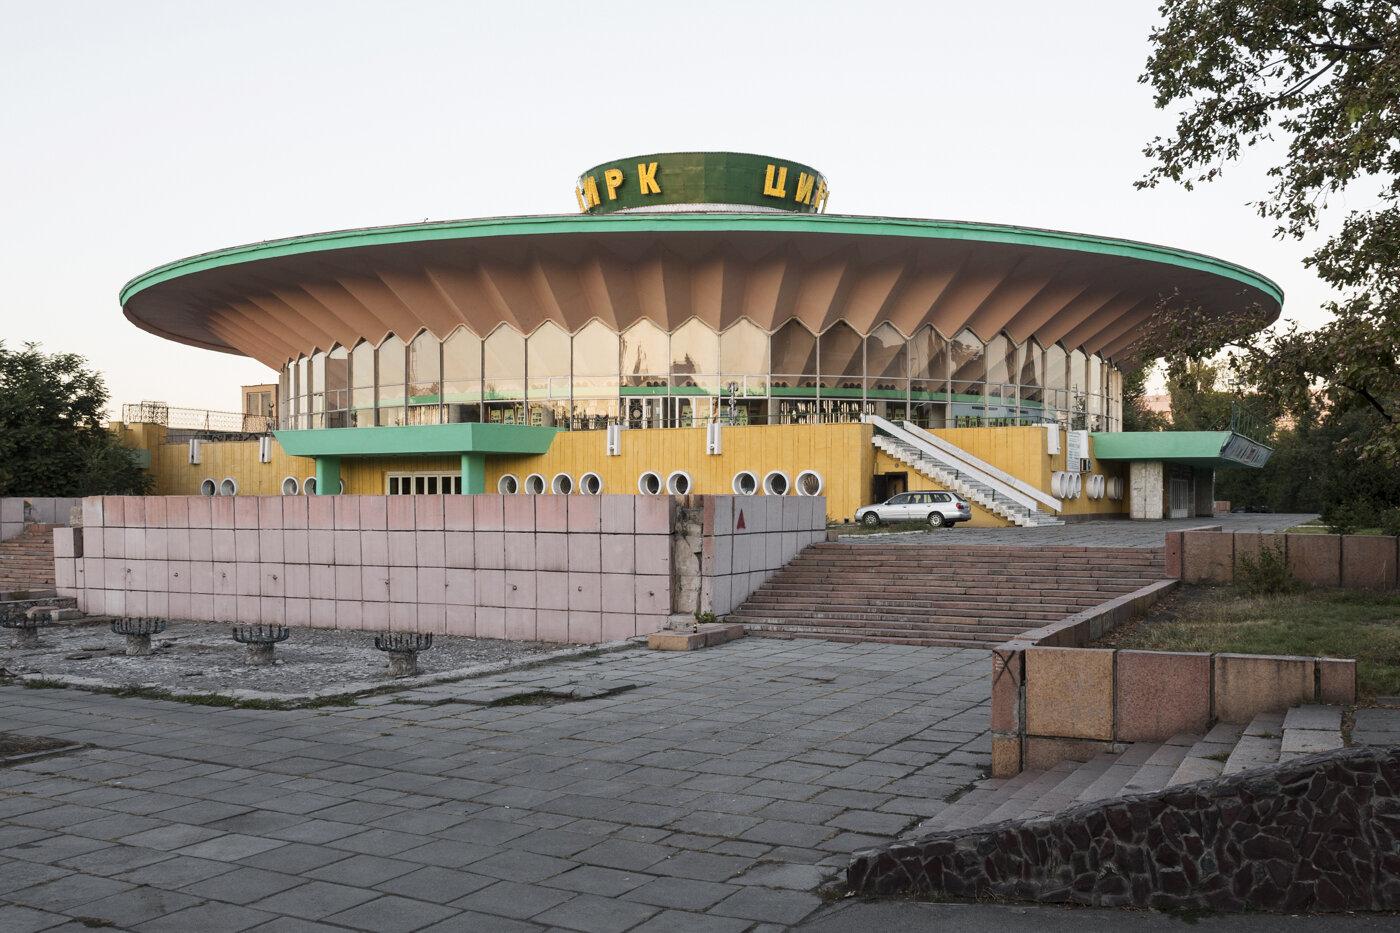 Circus, by L. Segal, I. Shadrin, D. Leontyev, V. Mironovich and A. Nezhurin (1976). Bishkek, Kyrgyzstan. Photo: Stefano Perego.